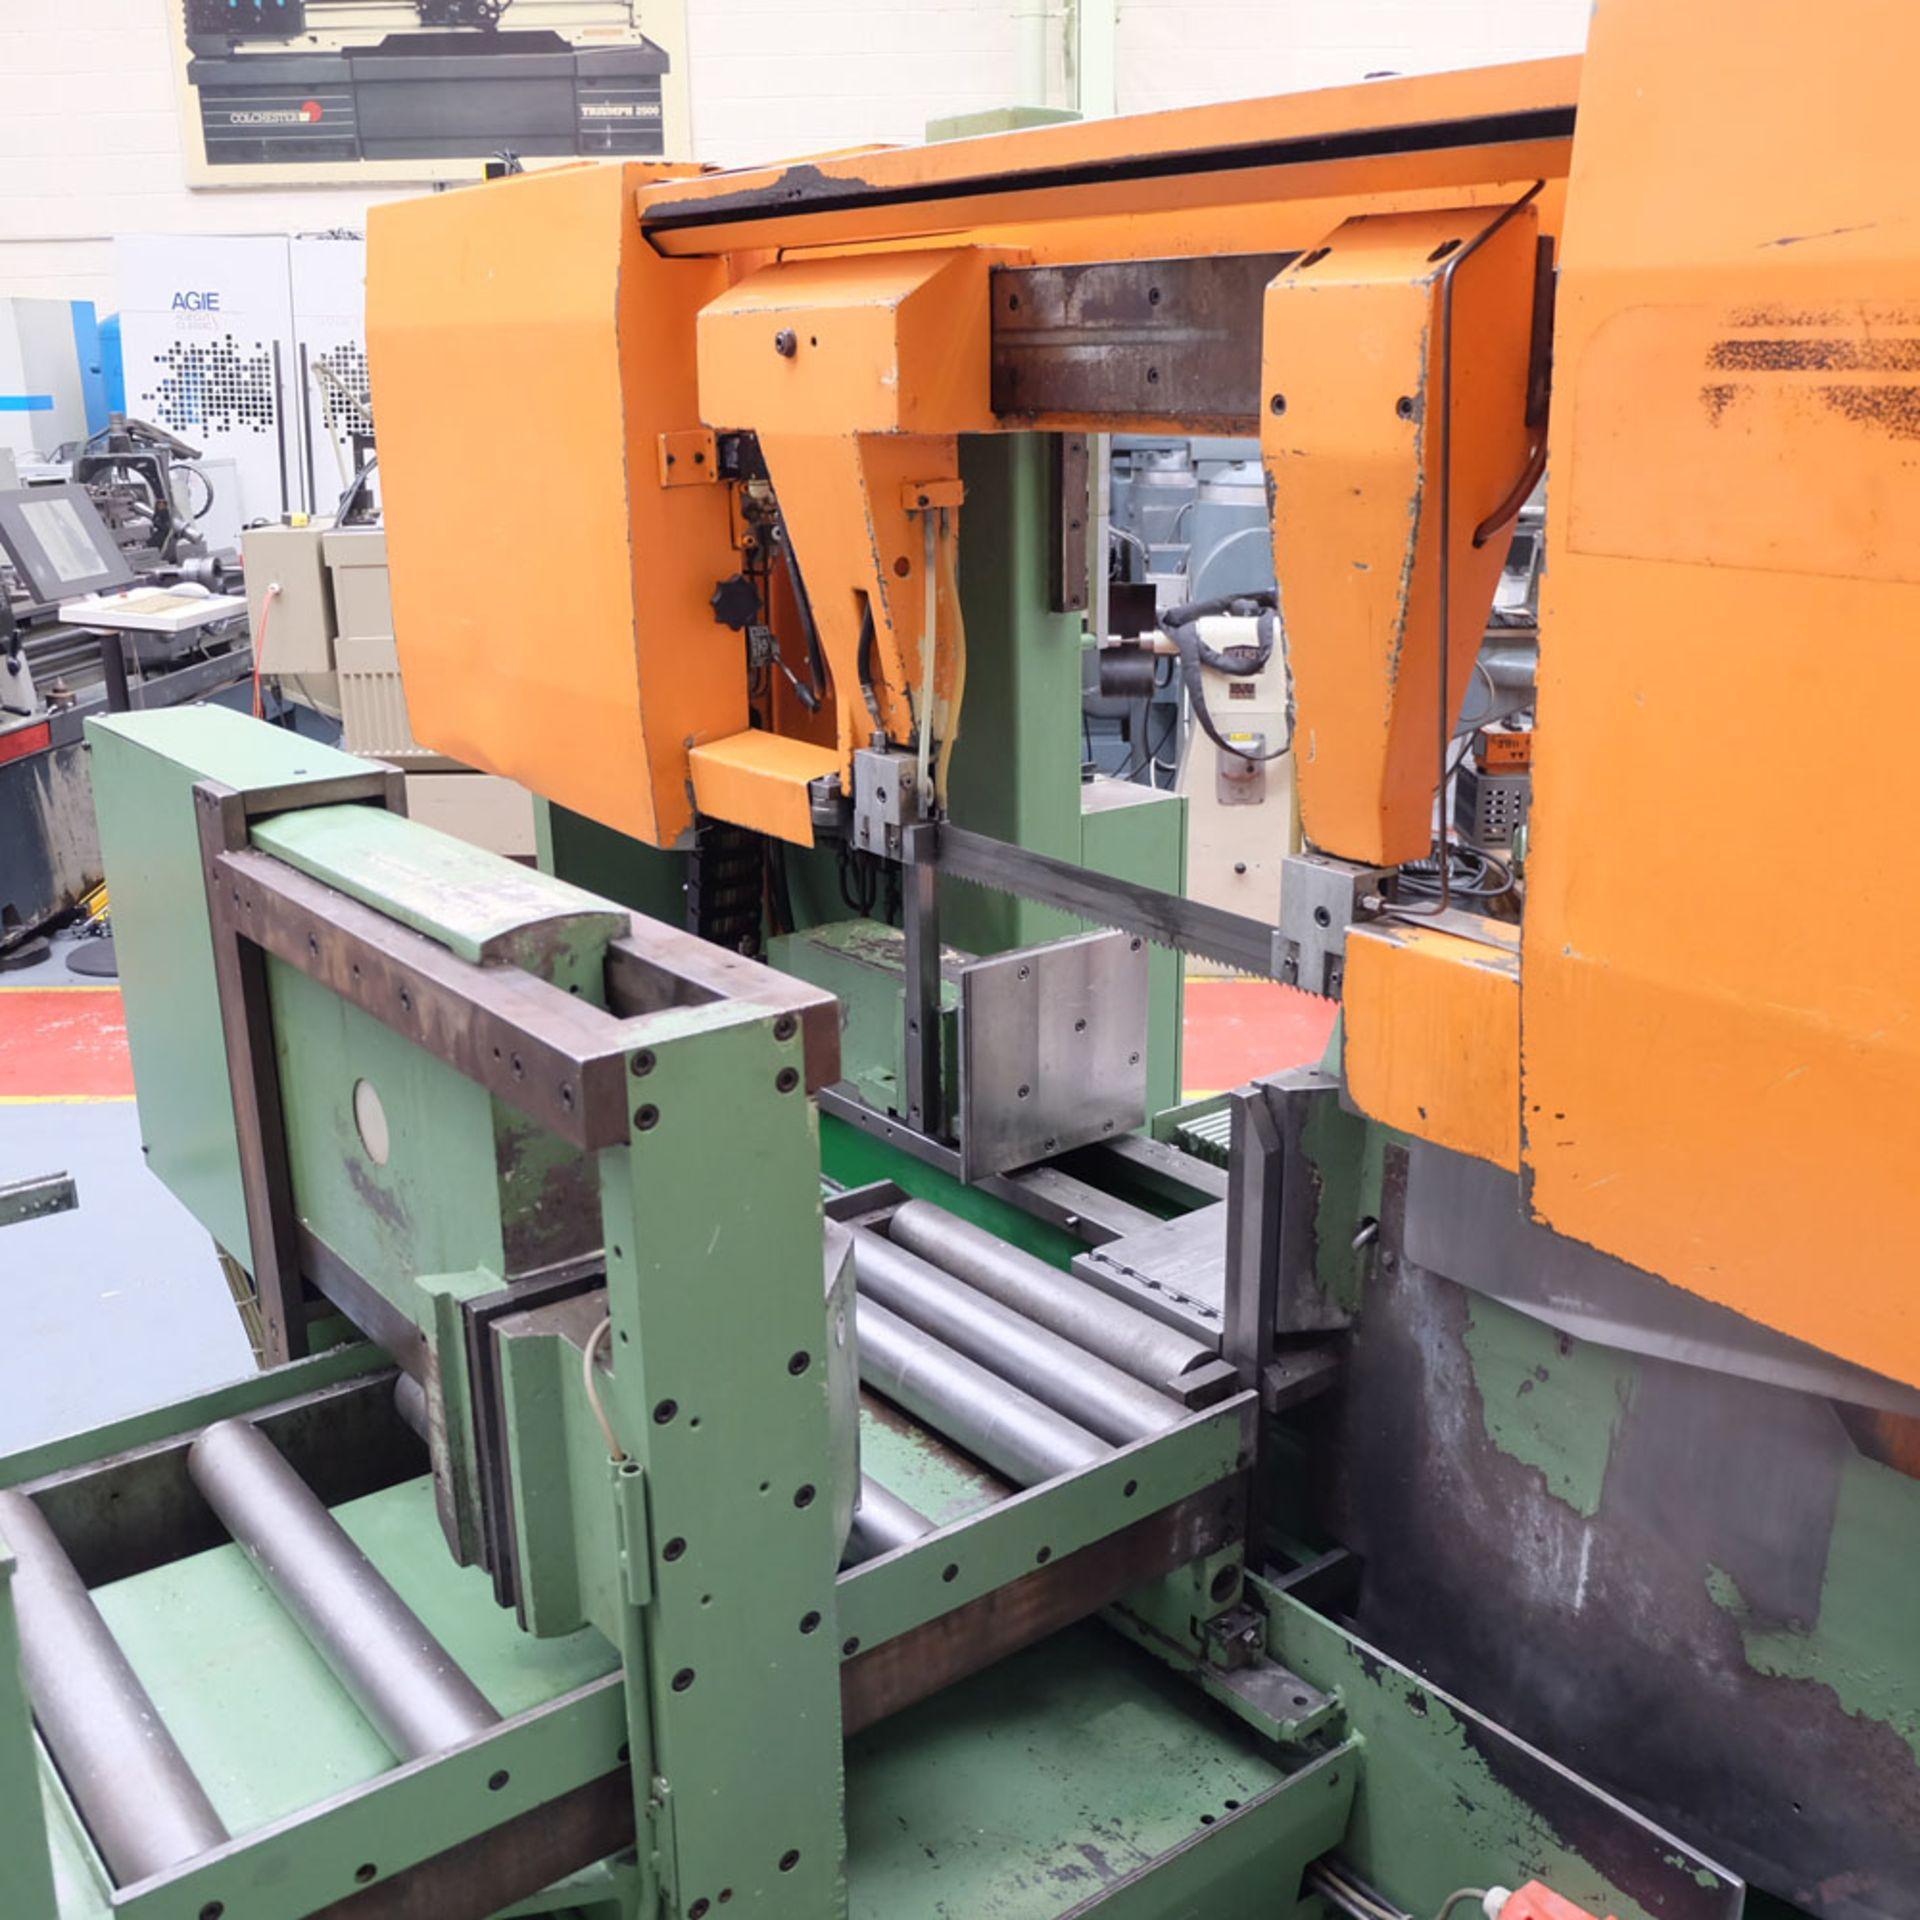 Kasto HBA 420 AU Heavy Duty Automatic Horizontal Band Sawing Machine. - Image 5 of 7